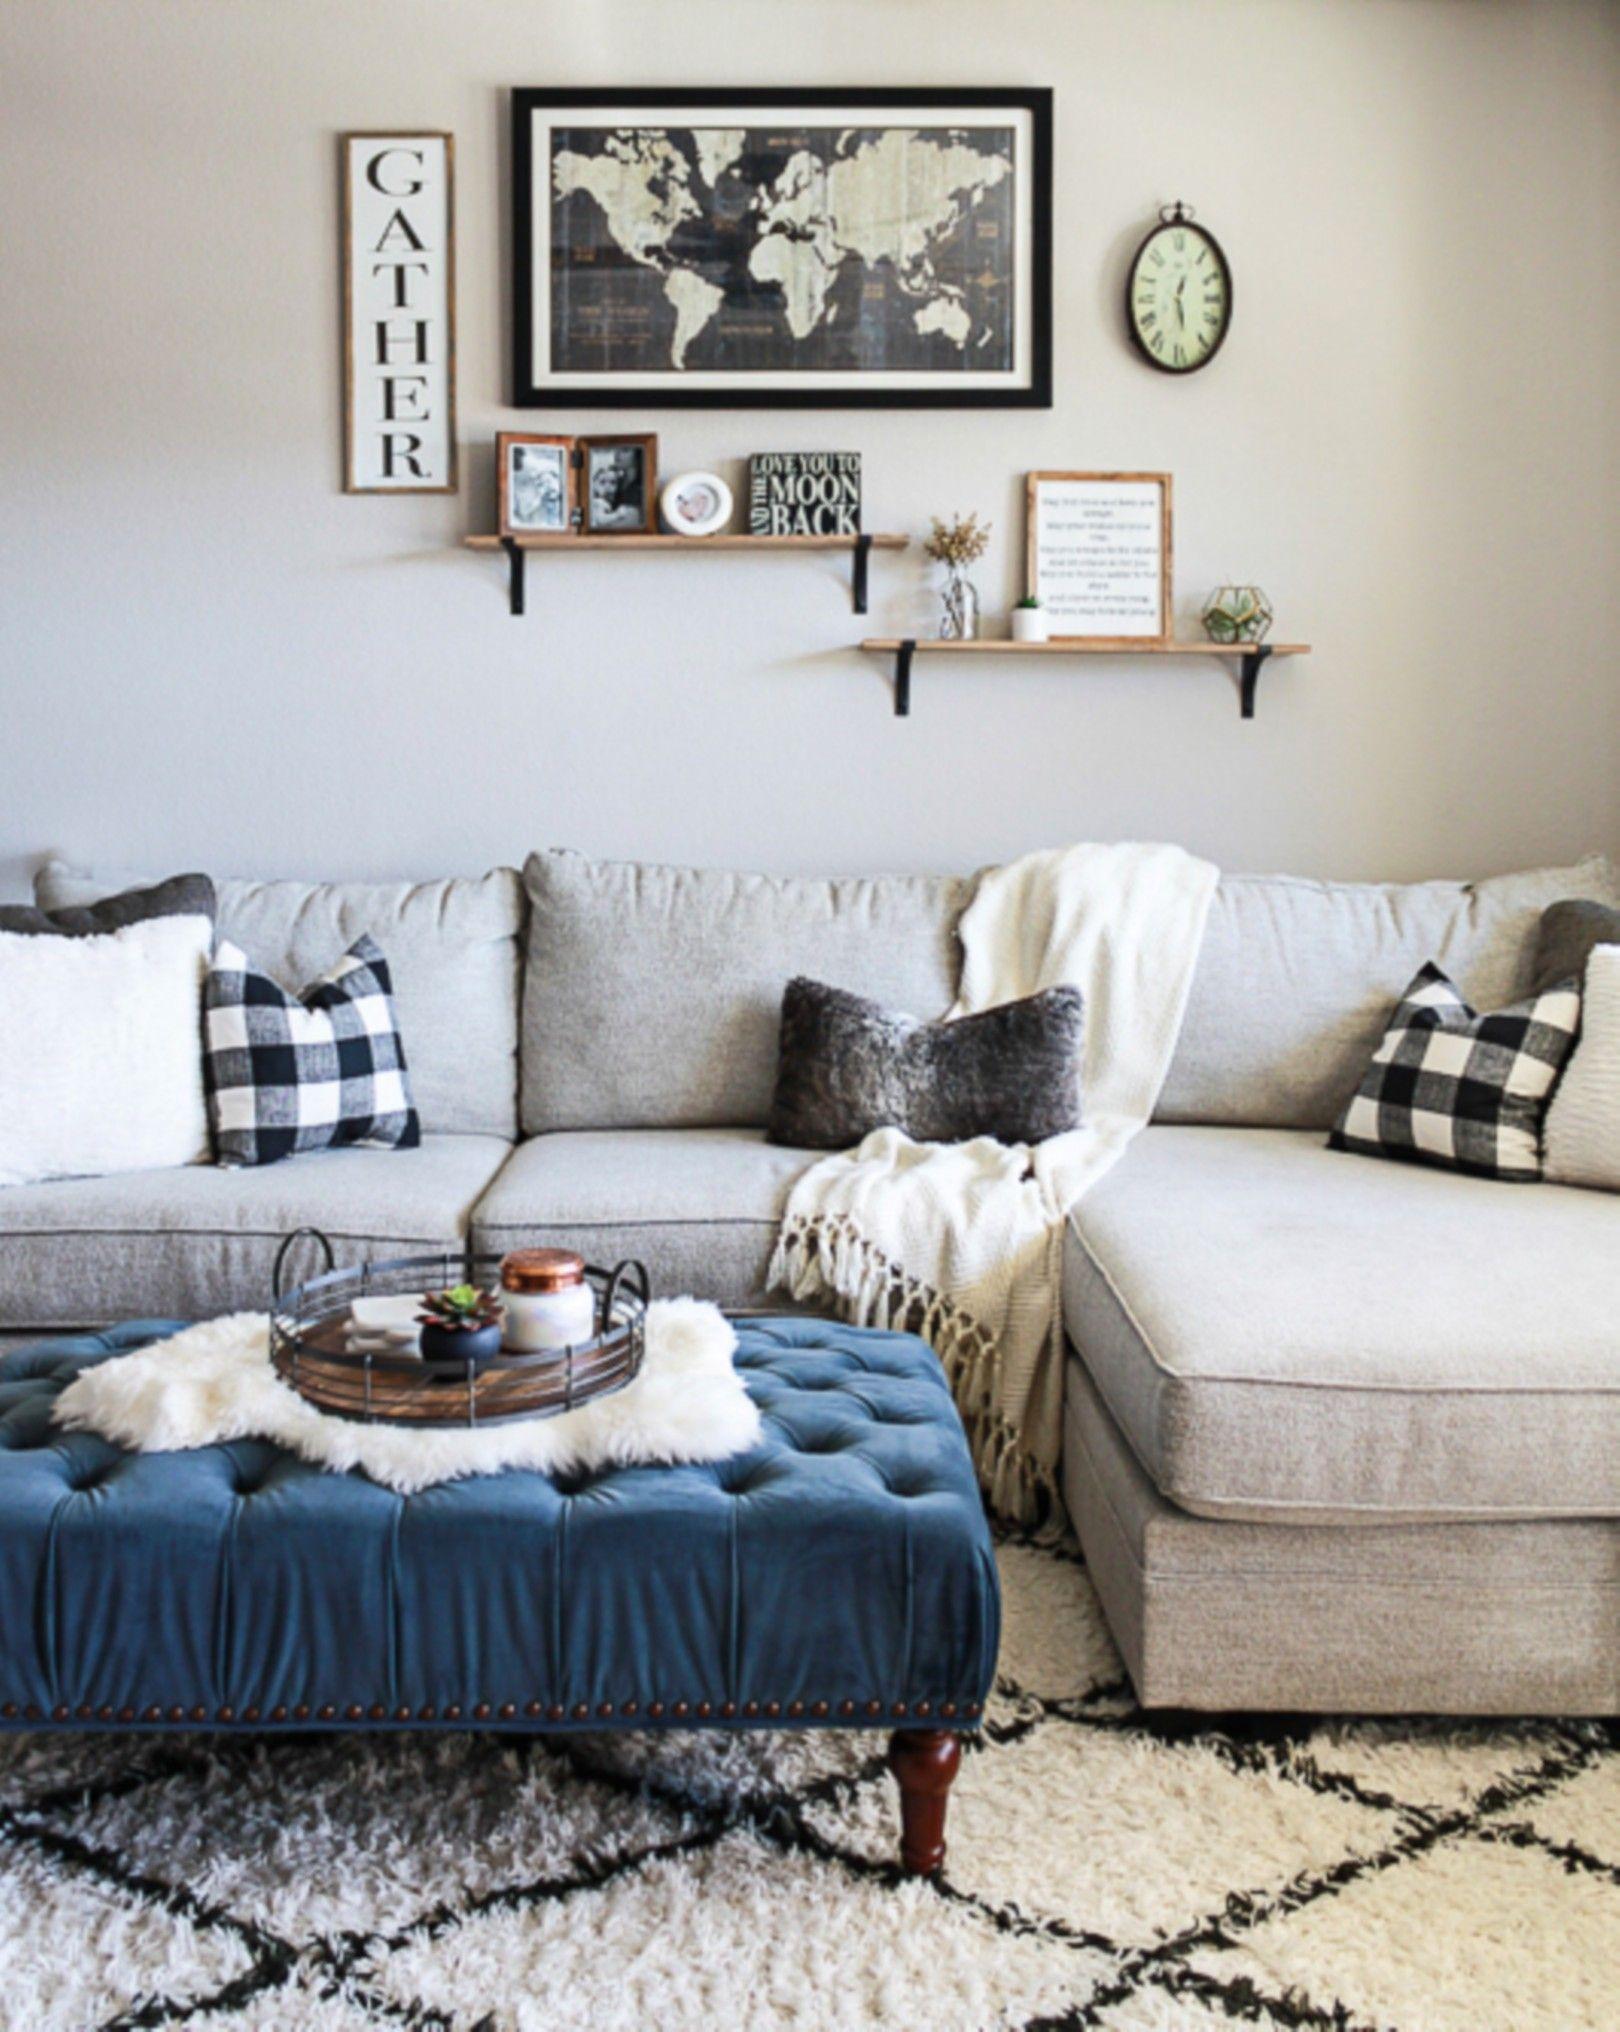 Httpliketkit2Suyw Liketoknowit Liketoknowithome Amazing Little Living Room Design Inspiration